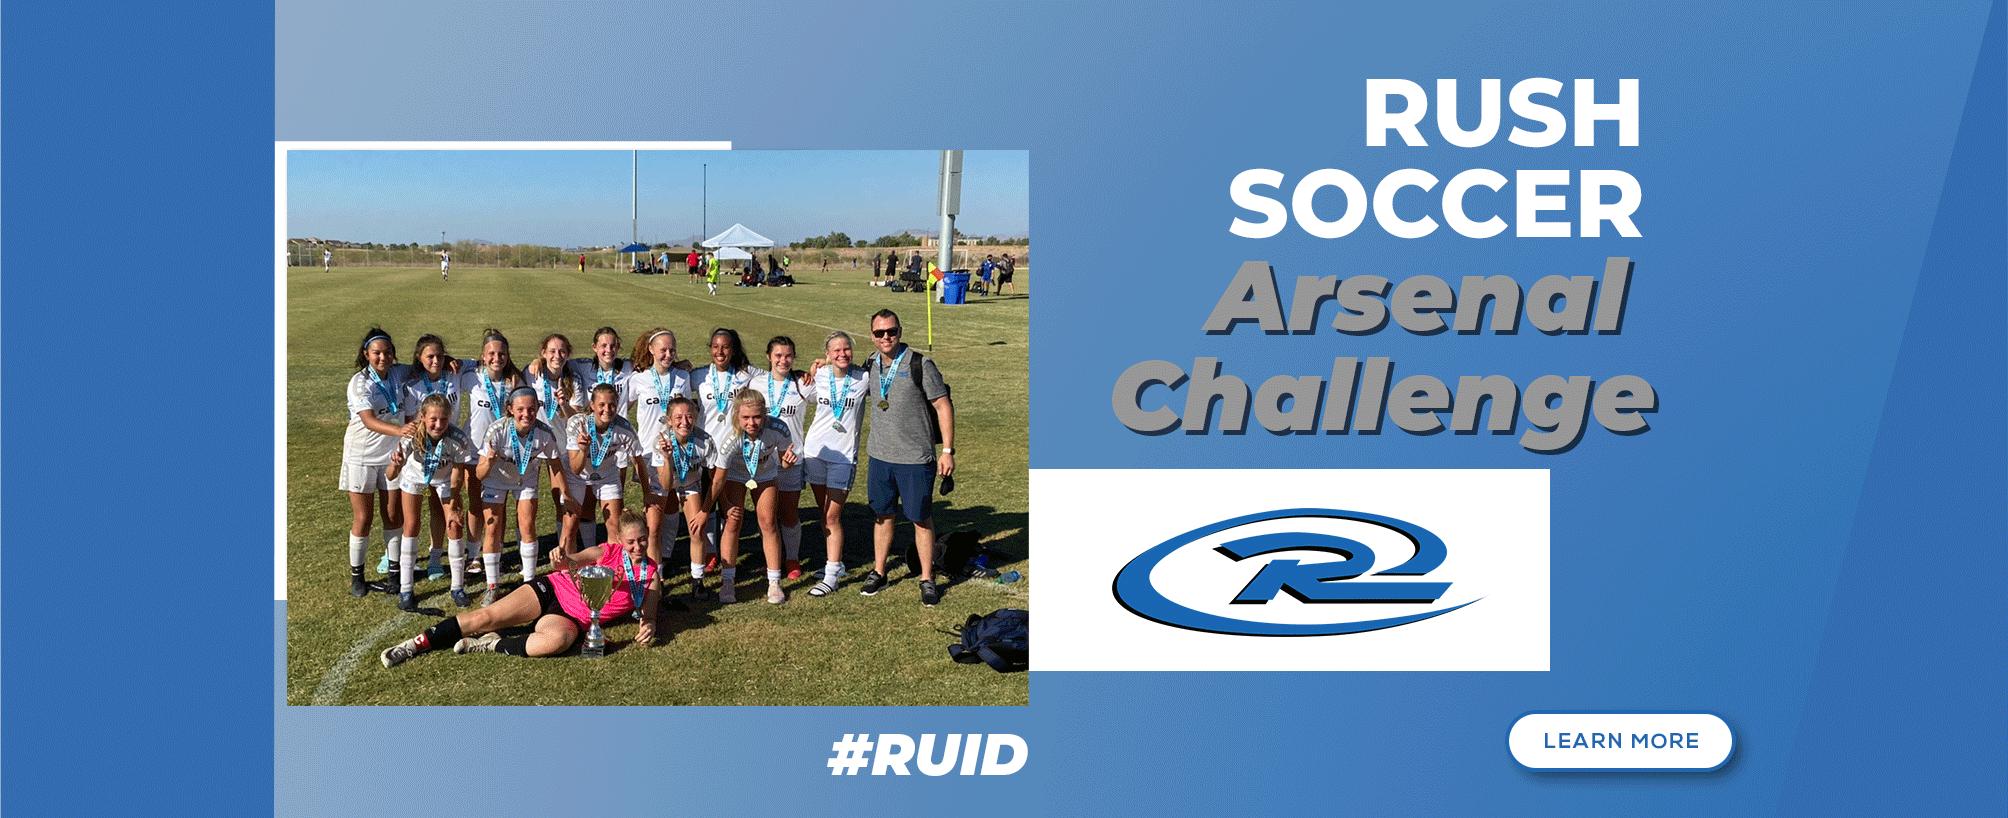 Rush-Soccer-Arsenal-Challenge